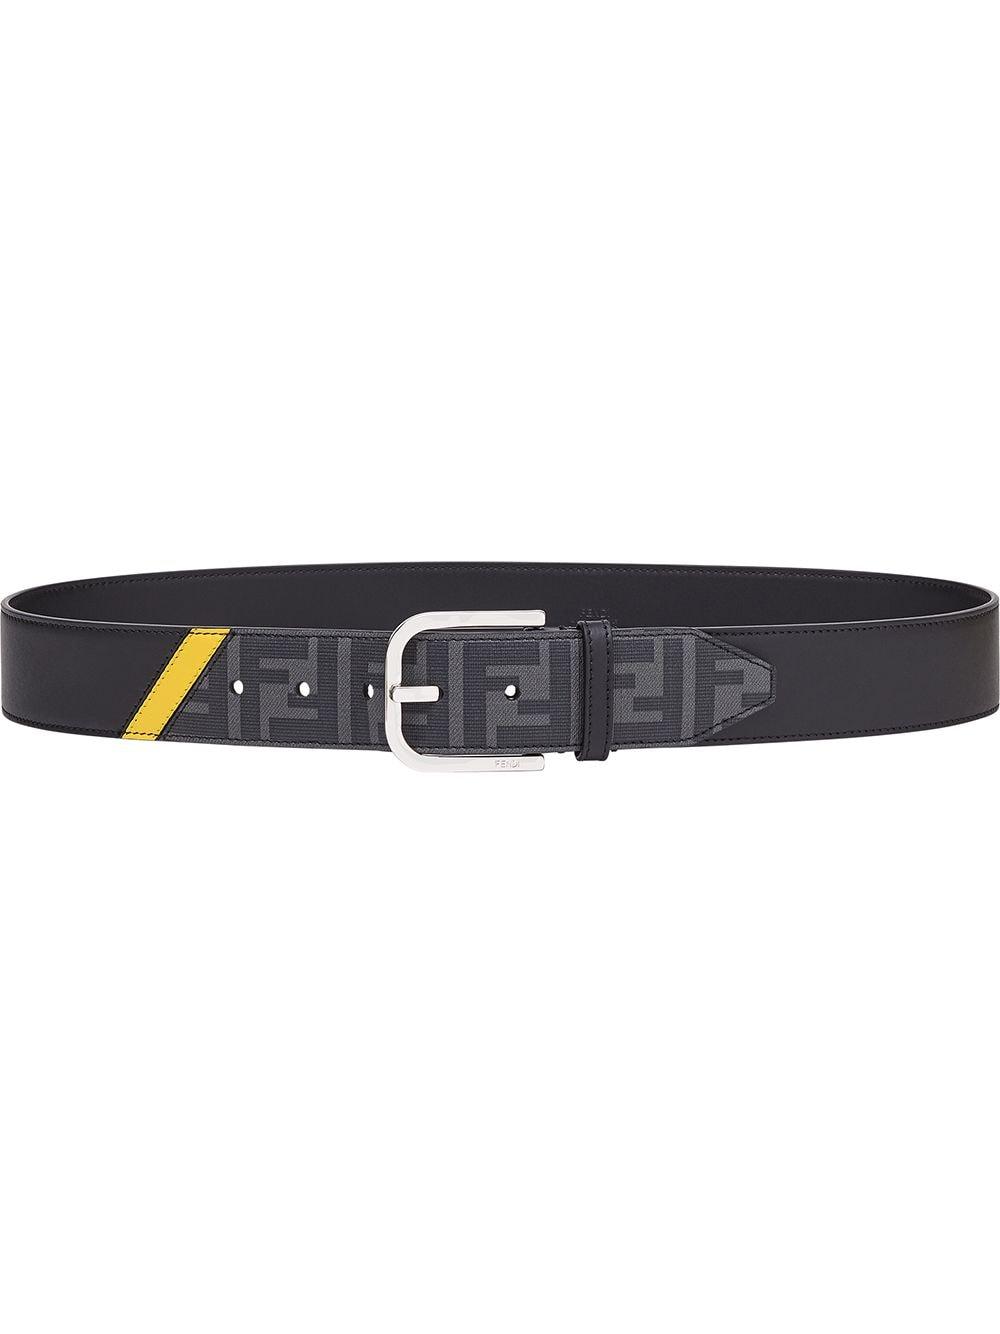 FENDI- Belt- Man- 95 - Black